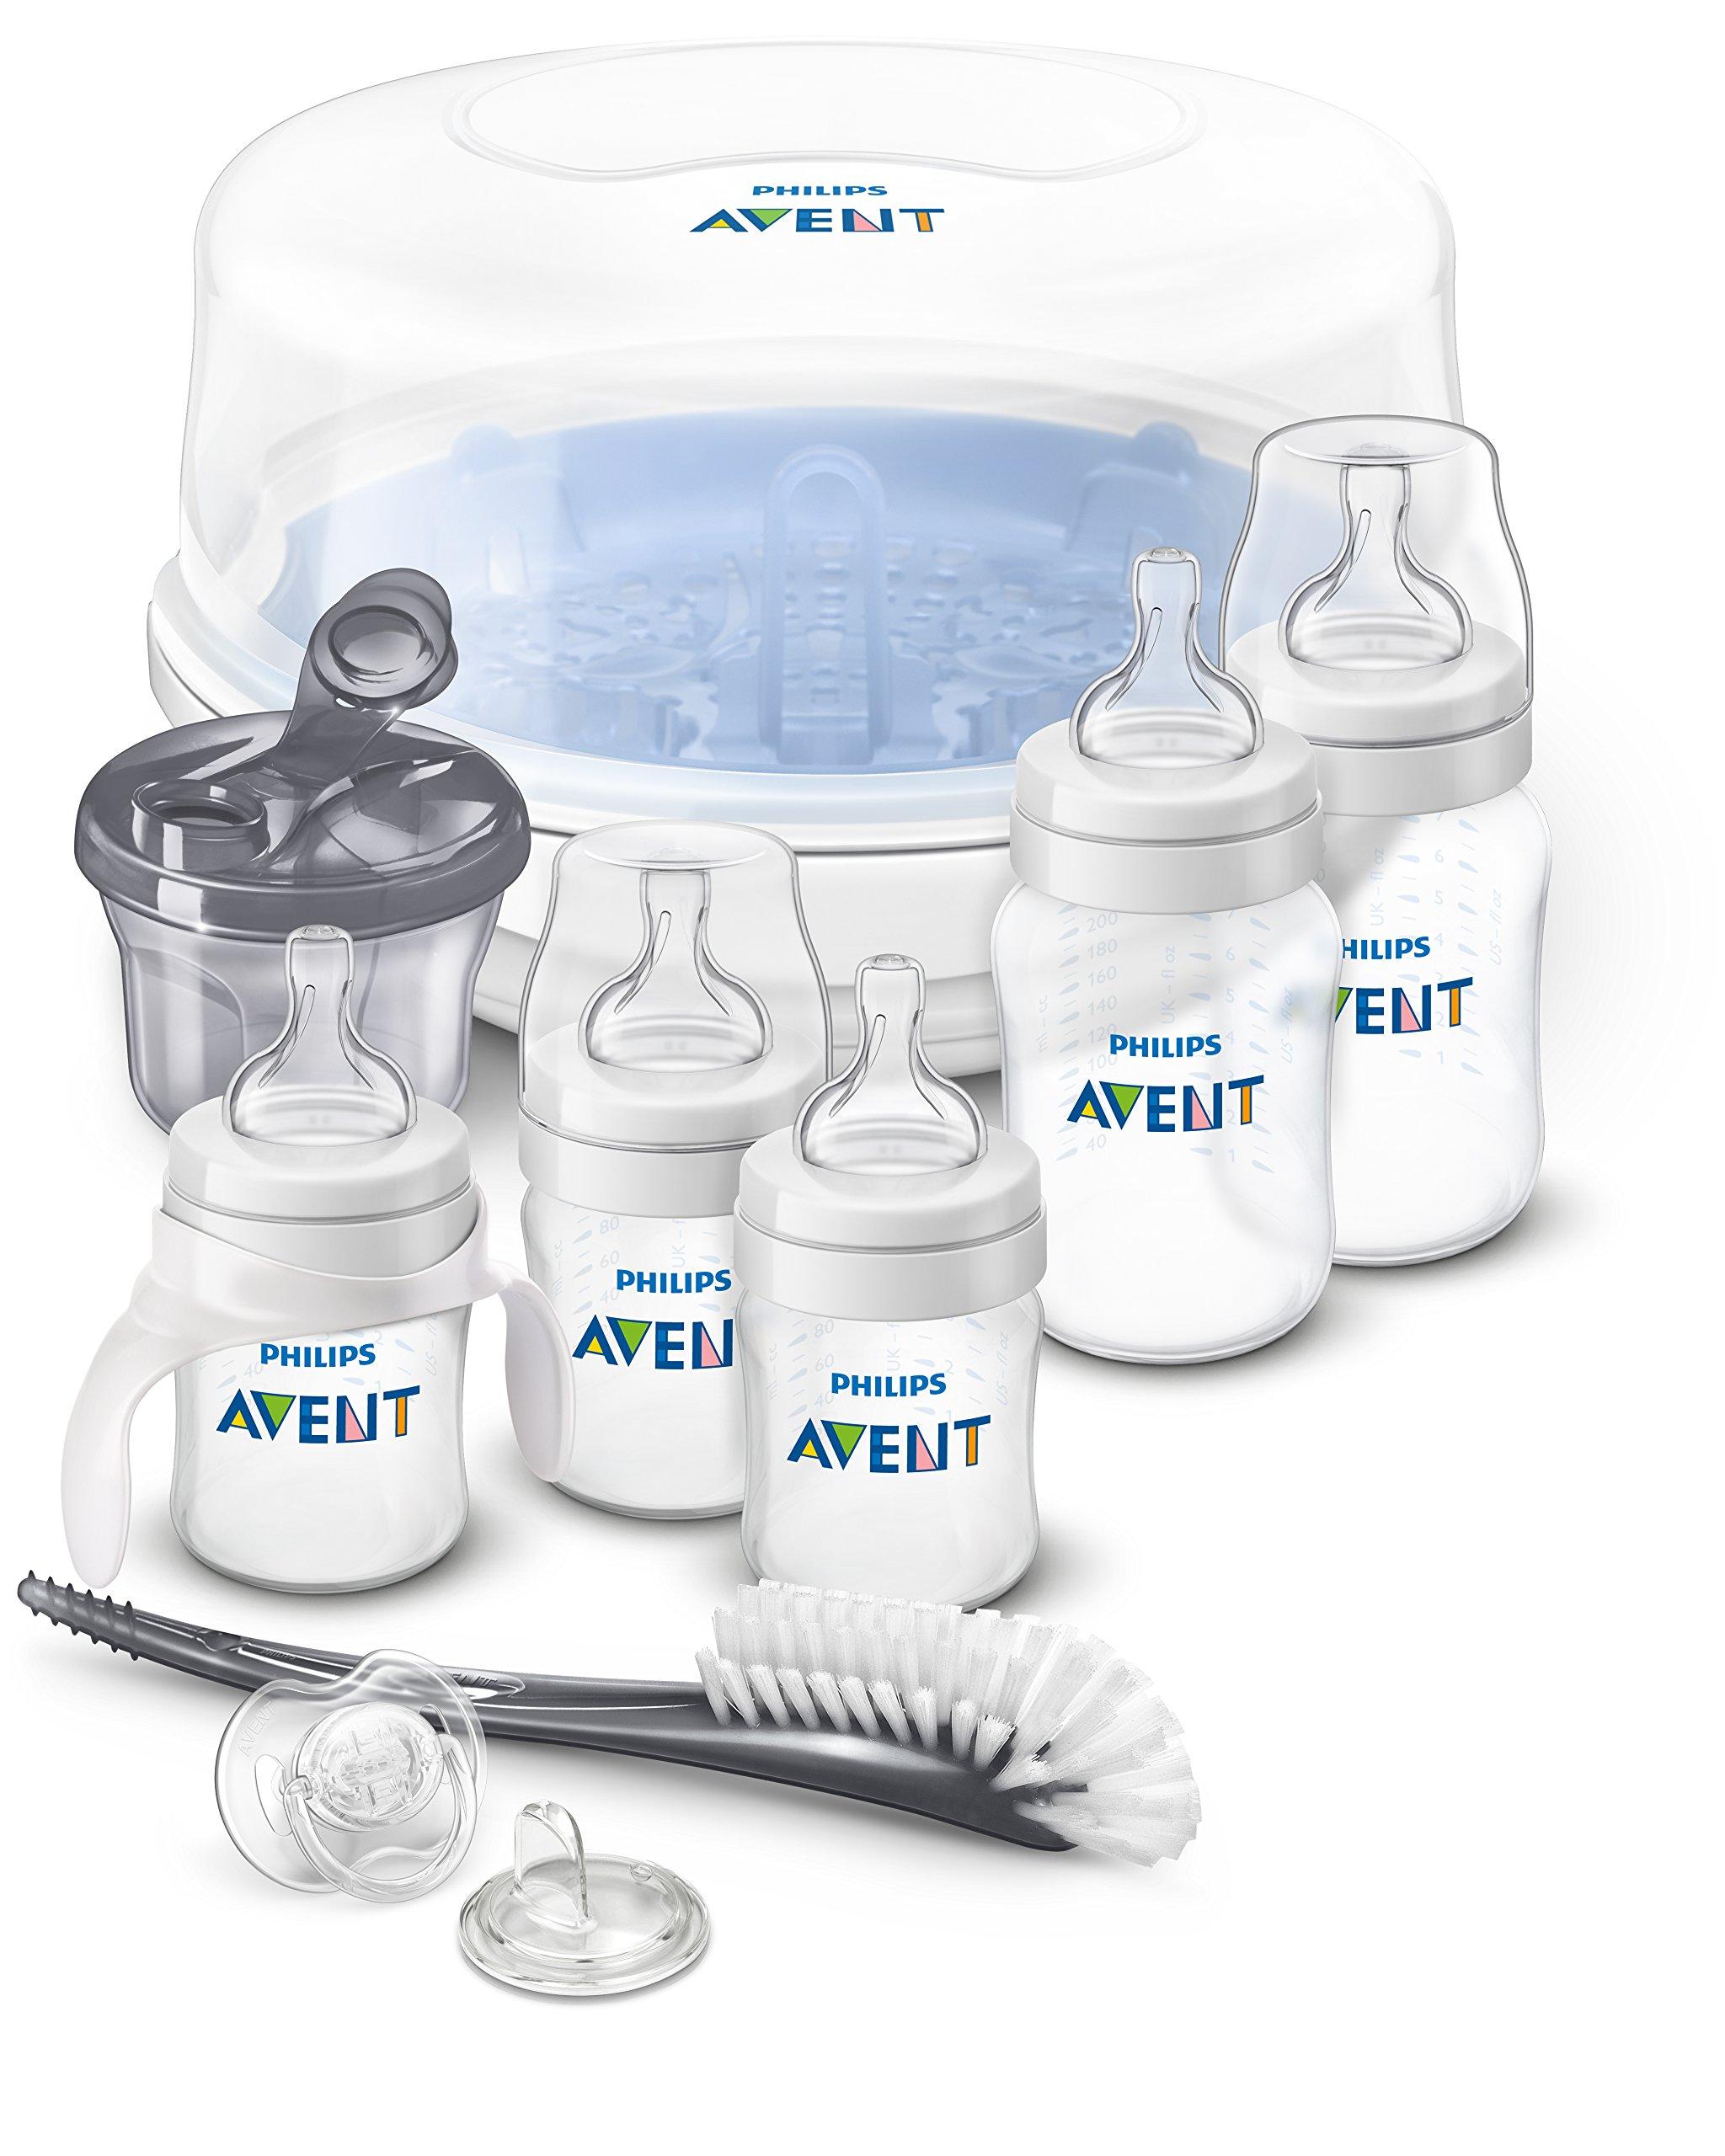 Philips AVENT Anti-Colic Bottle Essentials Newborn Starter Set, Clear